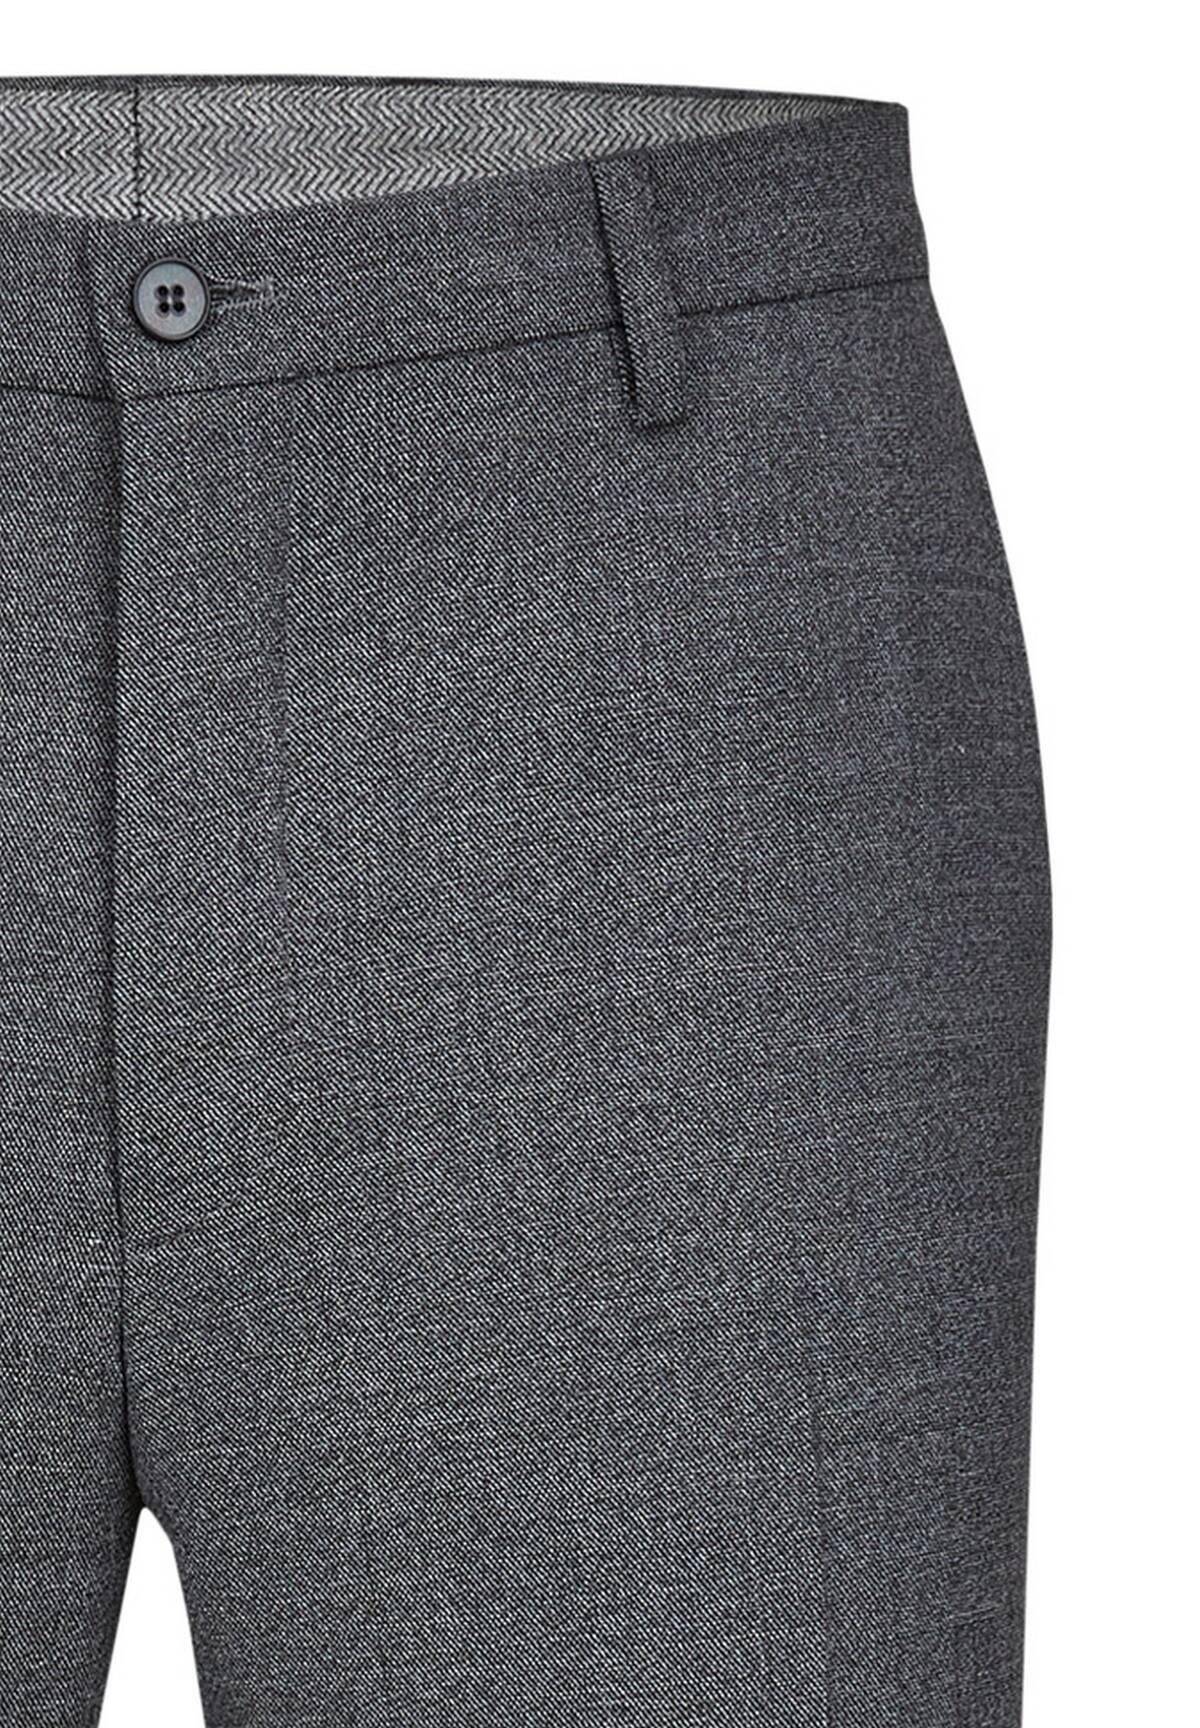 Pantalon de costume DH2O /